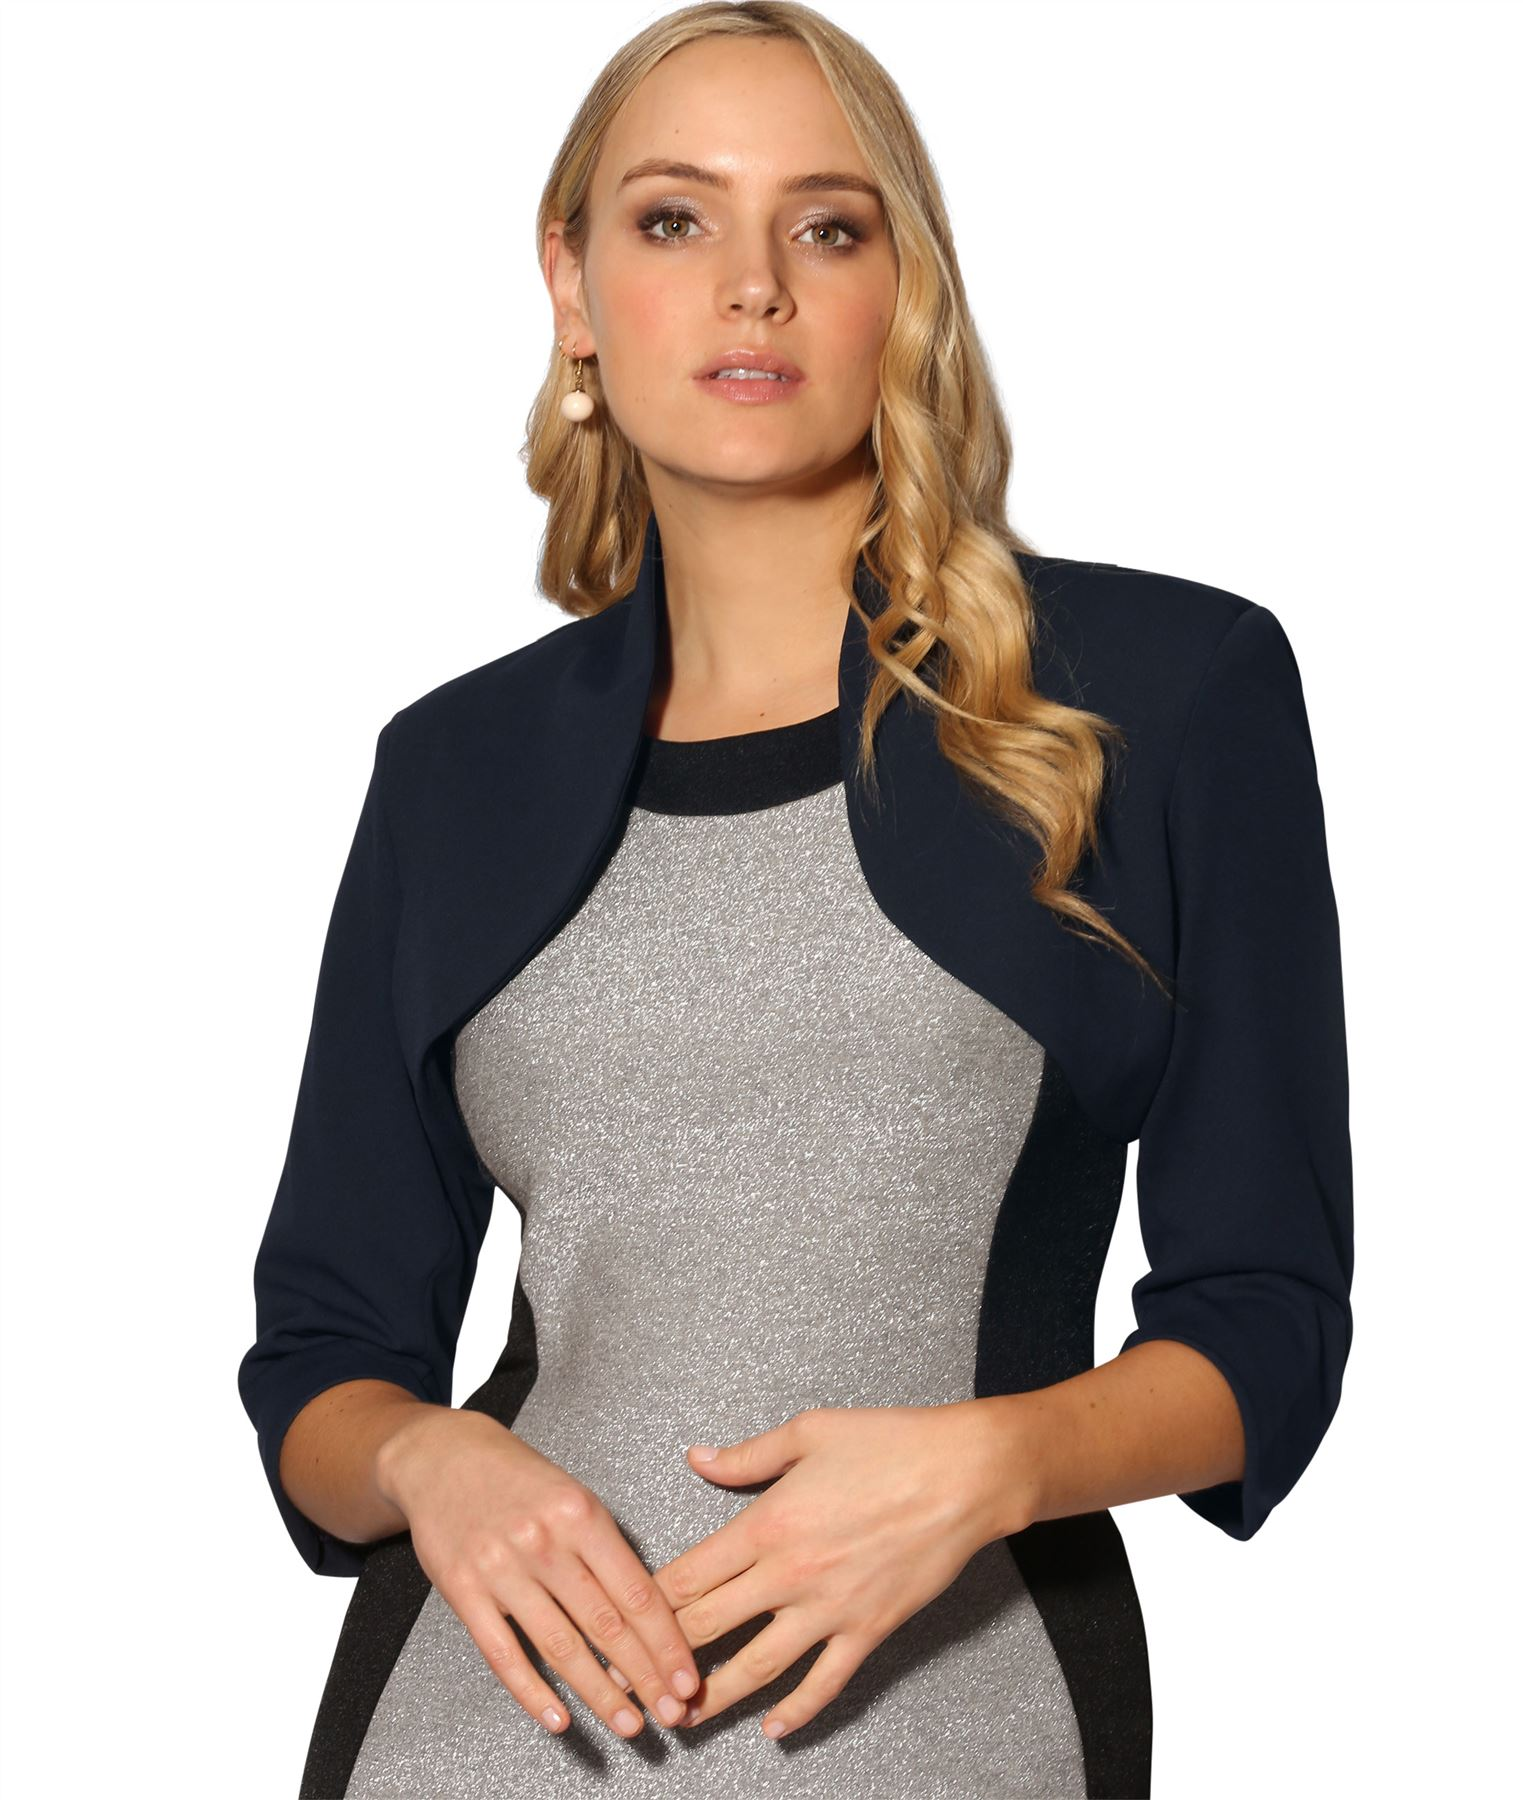 Womens-Tailored-Bolero-Shrug-Cropped-Top-Short-Sleeve-Party-Blazer-Jacket-Coat thumbnail 6